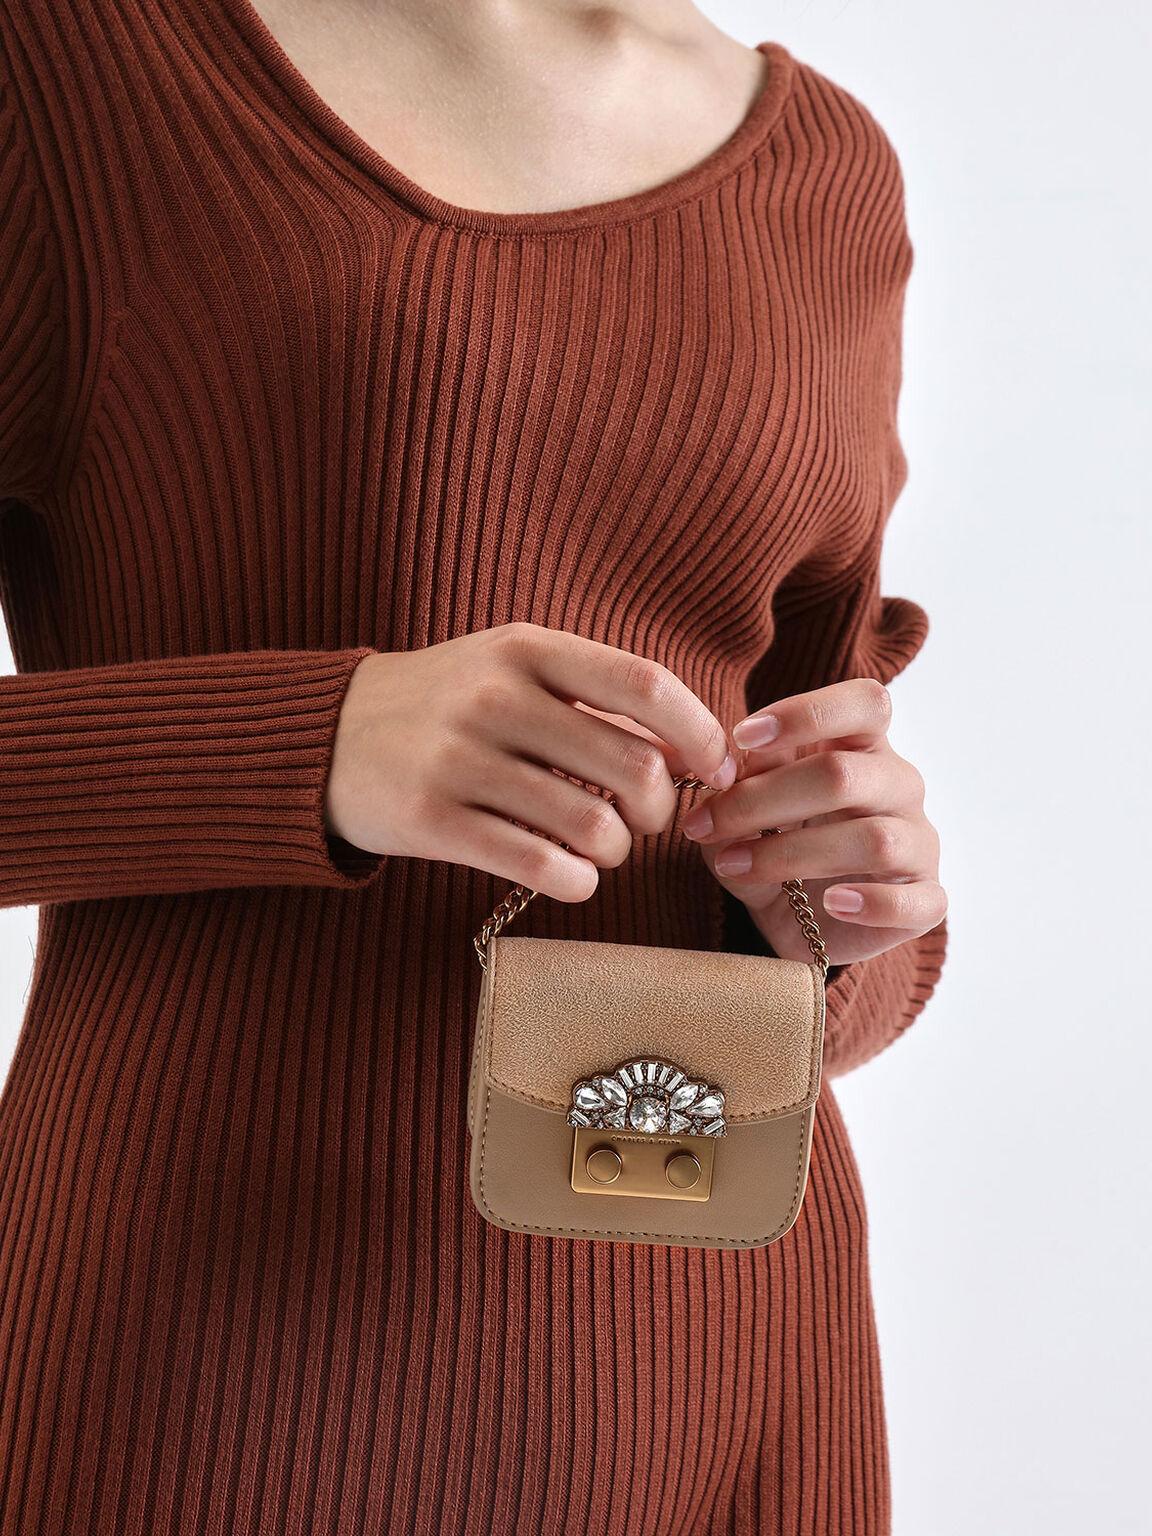 Mini Embellished Buckle Key Pouch, Beige, hi-res